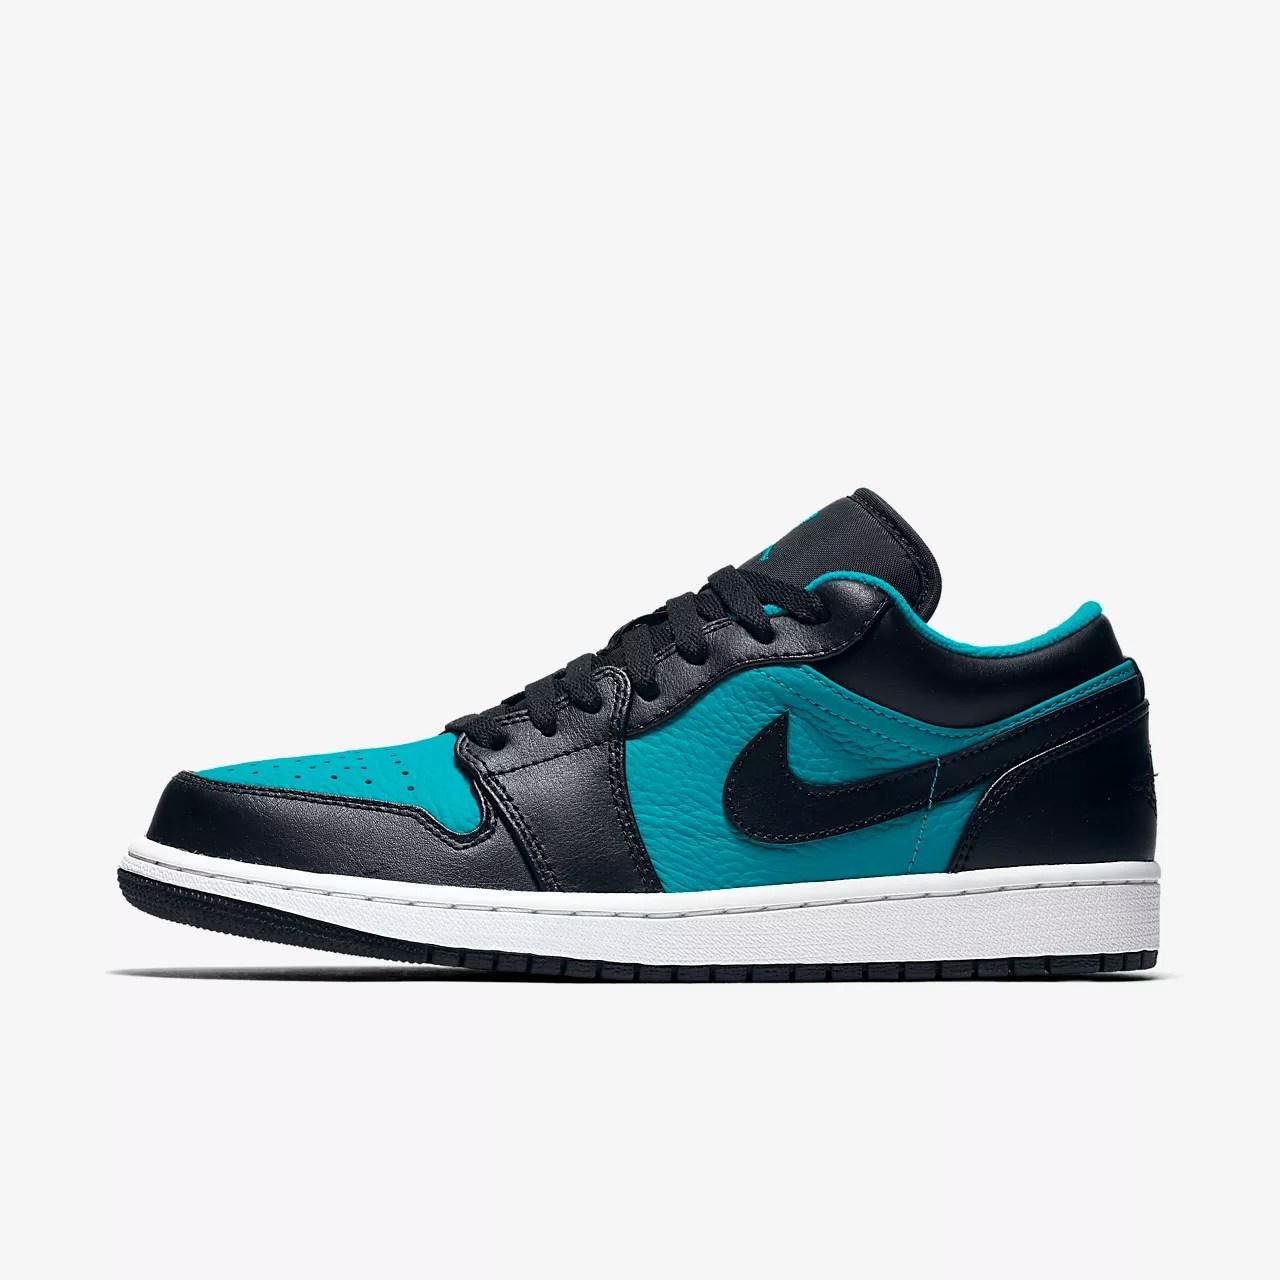 Air Jordan 1 低筒鞋款. Nike TW